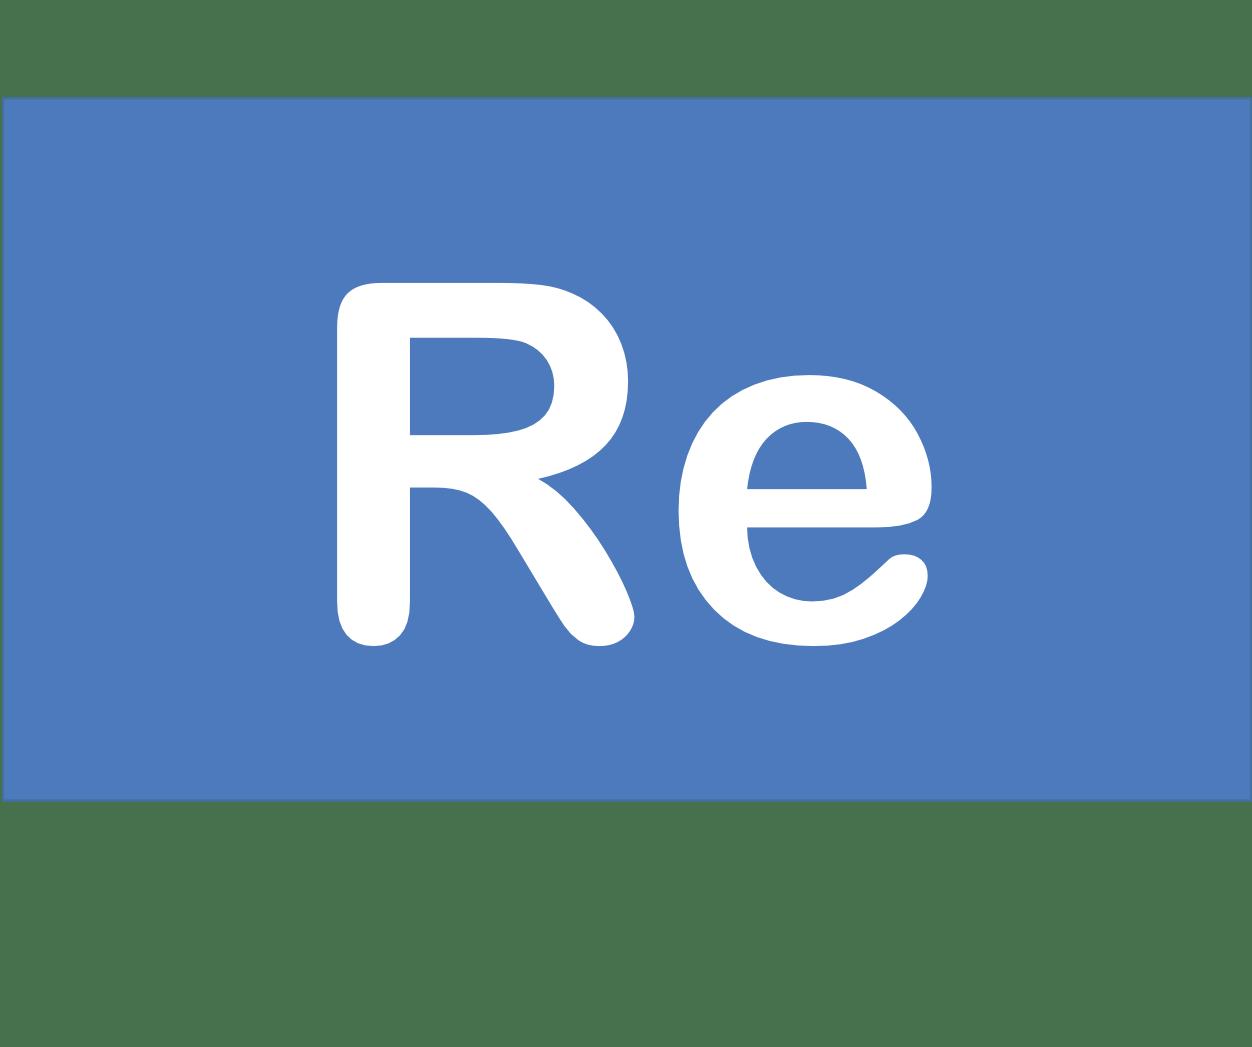 75 Re レニウム Rhenium 元素 記号 周期表 化学 原子